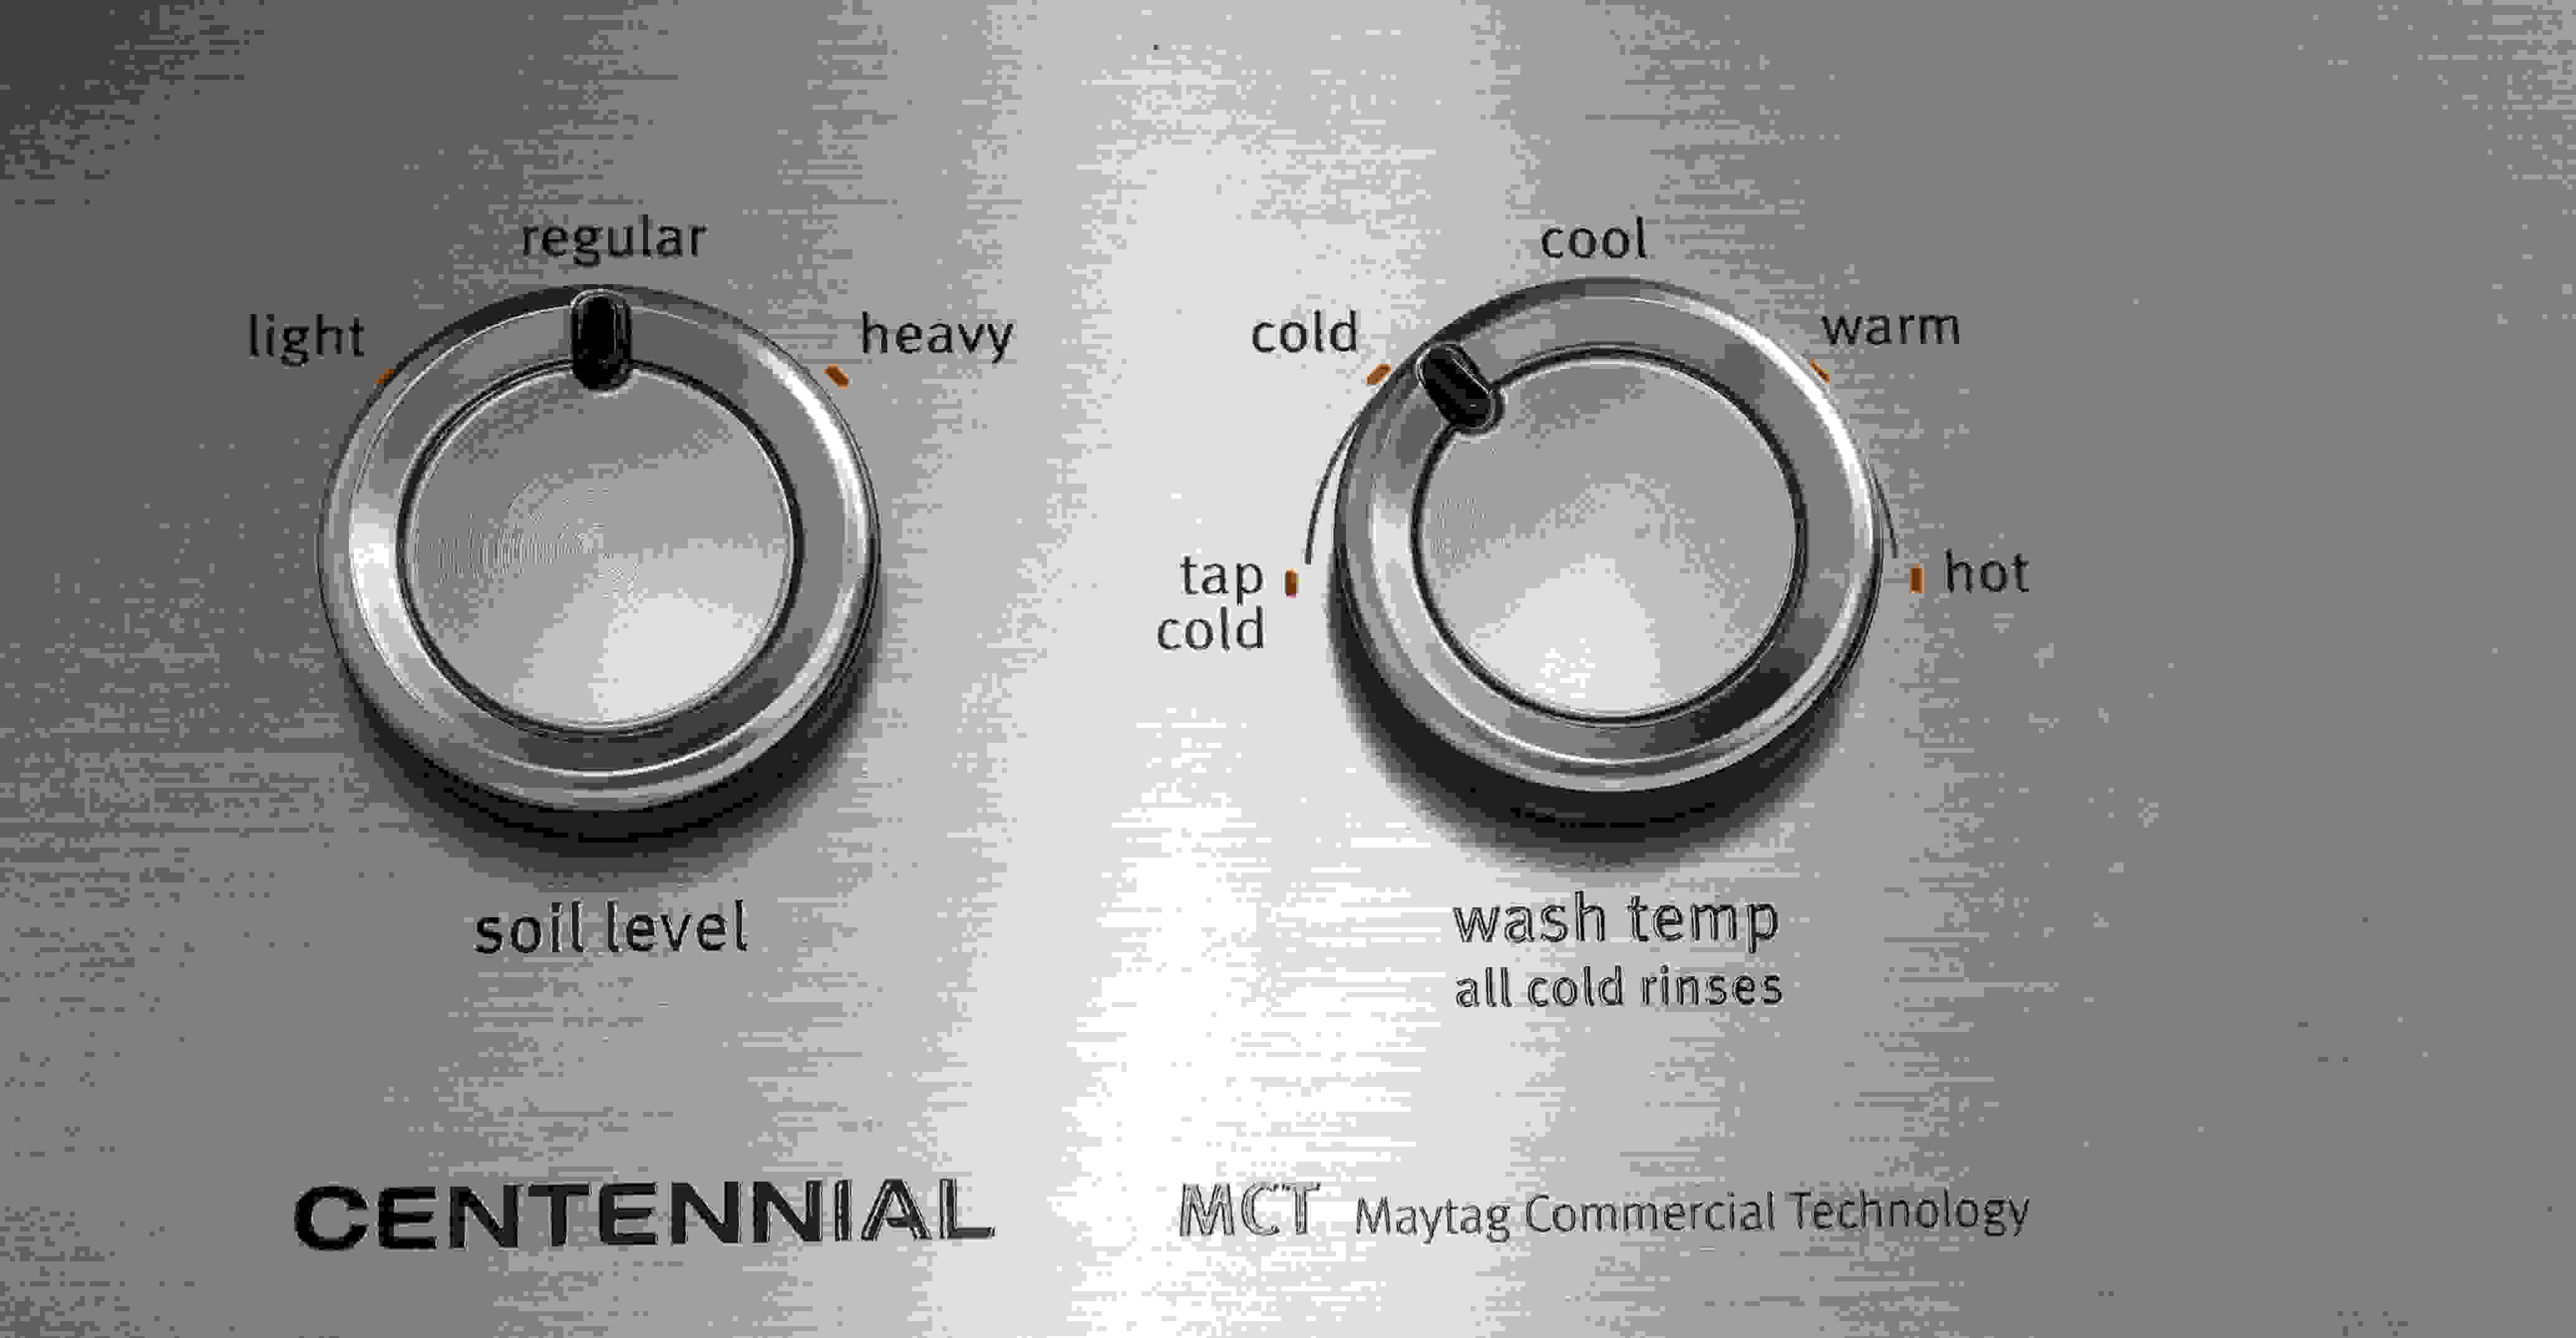 Simple controls make this Centennial worth celebrating.